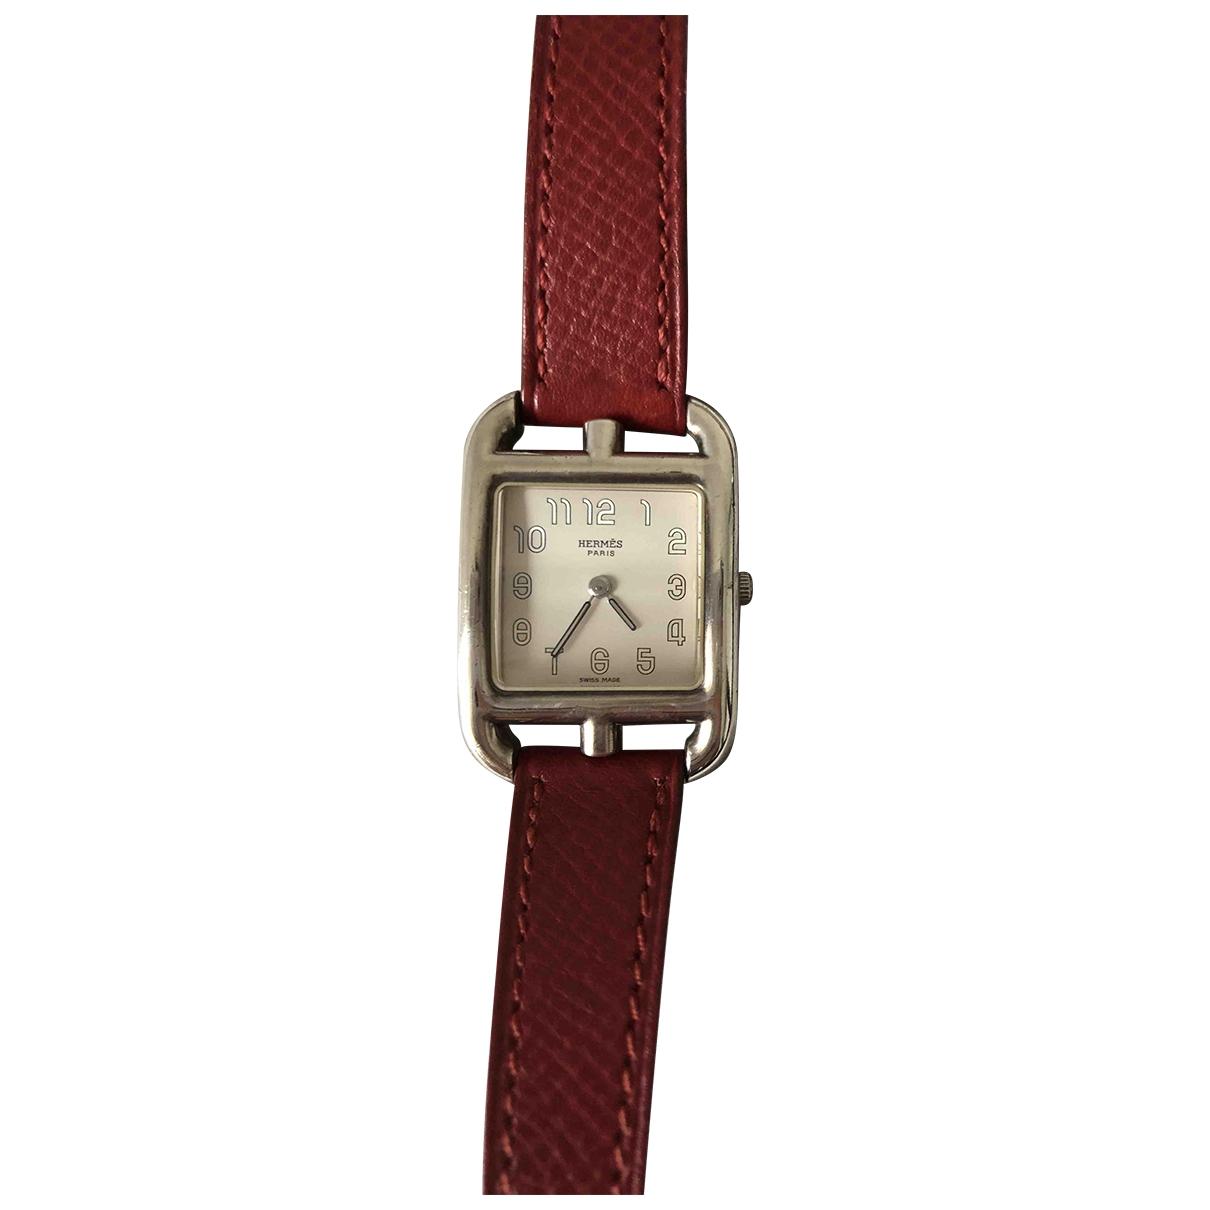 Reloj Cape Cod de Plata Hermes